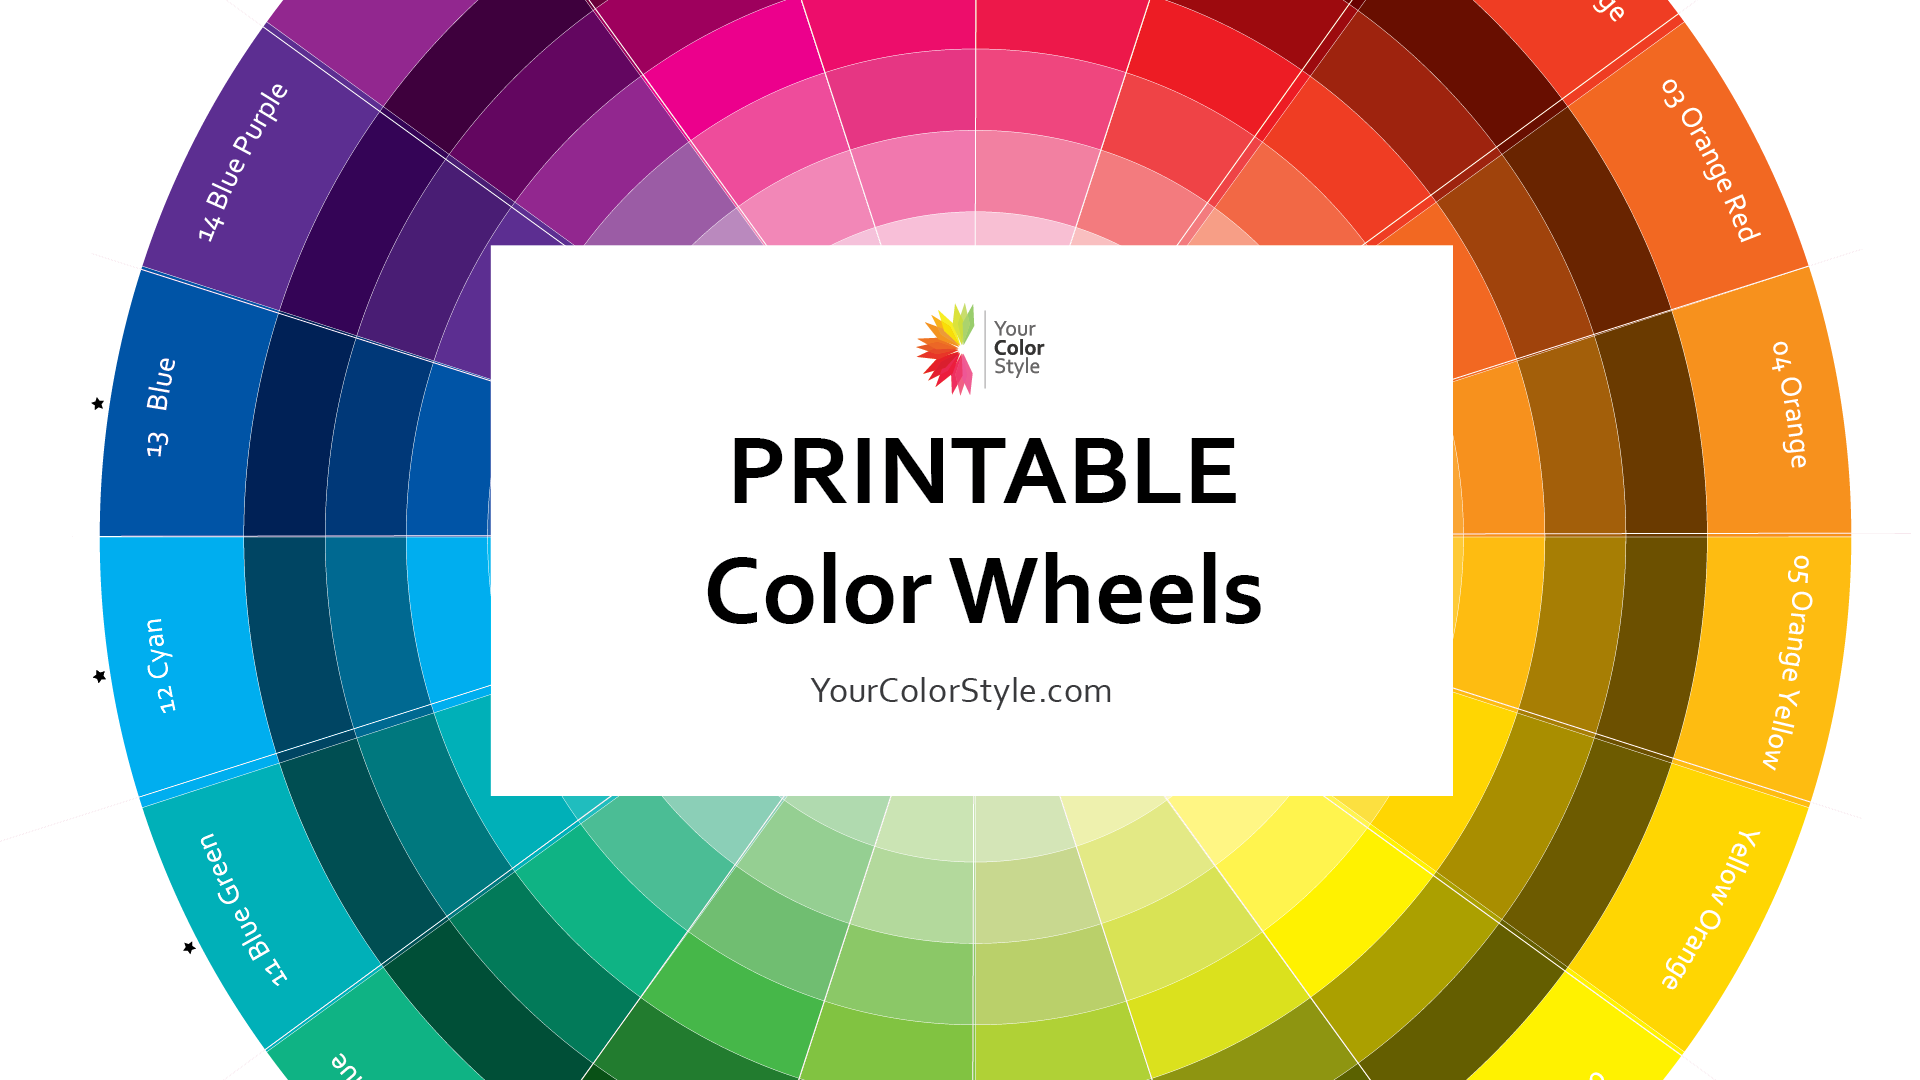 Printable Color Wheels